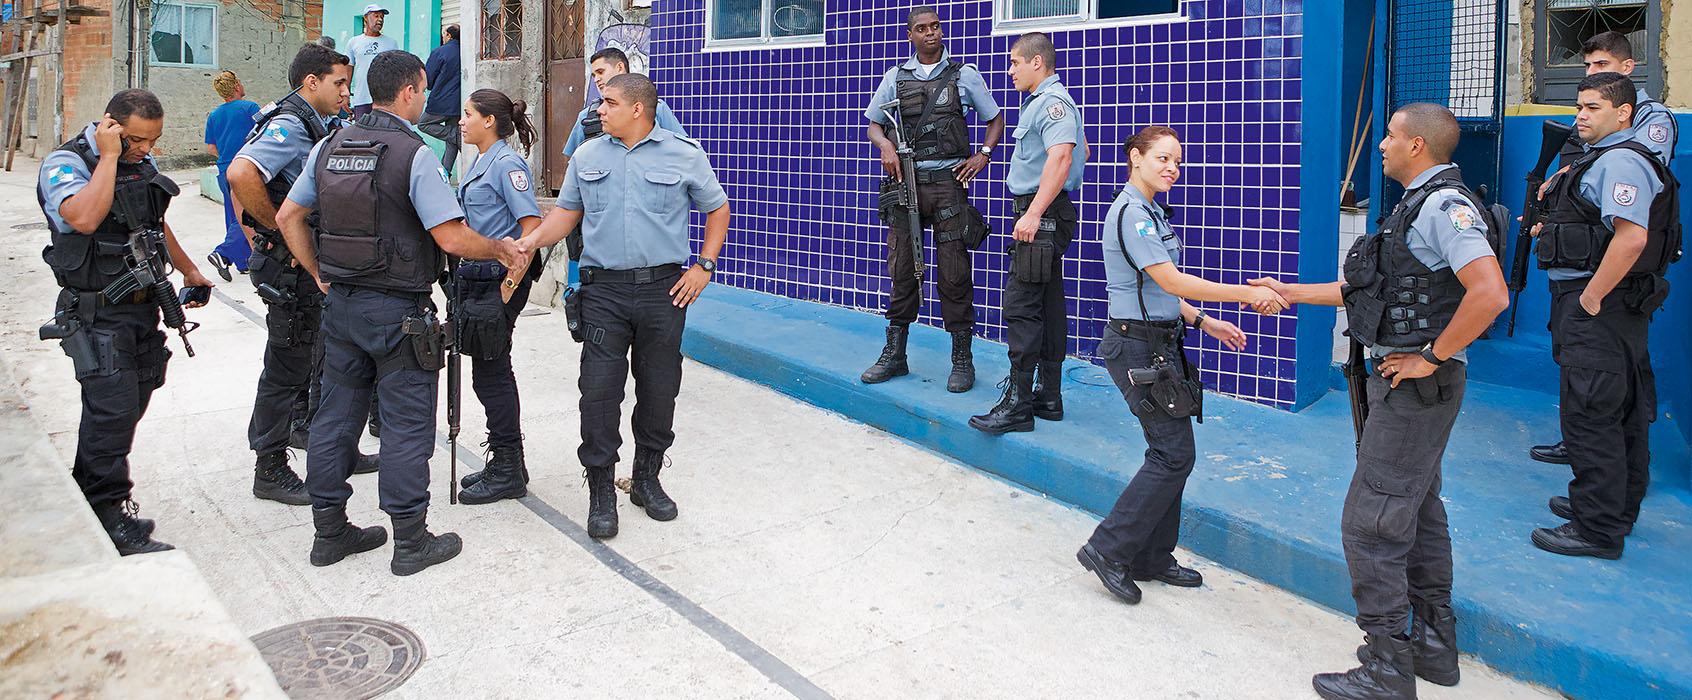 mvg_Rio_#64_Polizia_relax